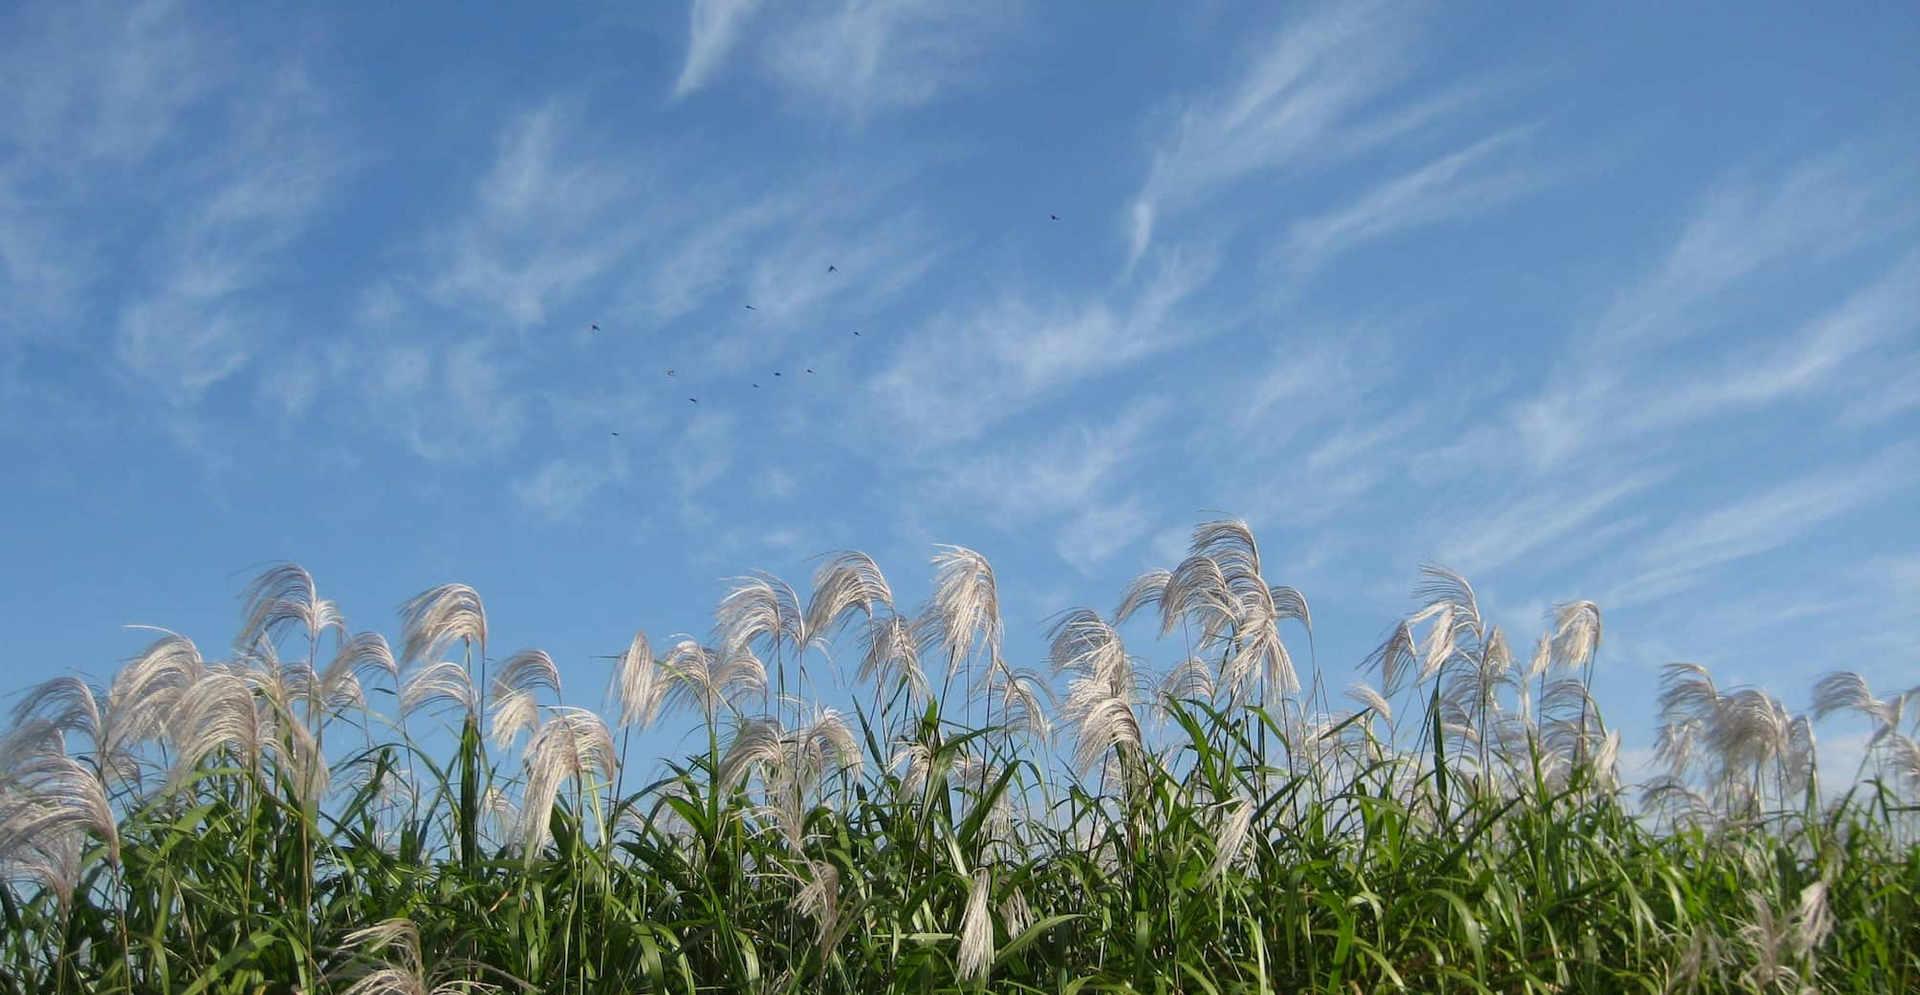 Ogi(Amur silvergrass) in Heijokyo ruins